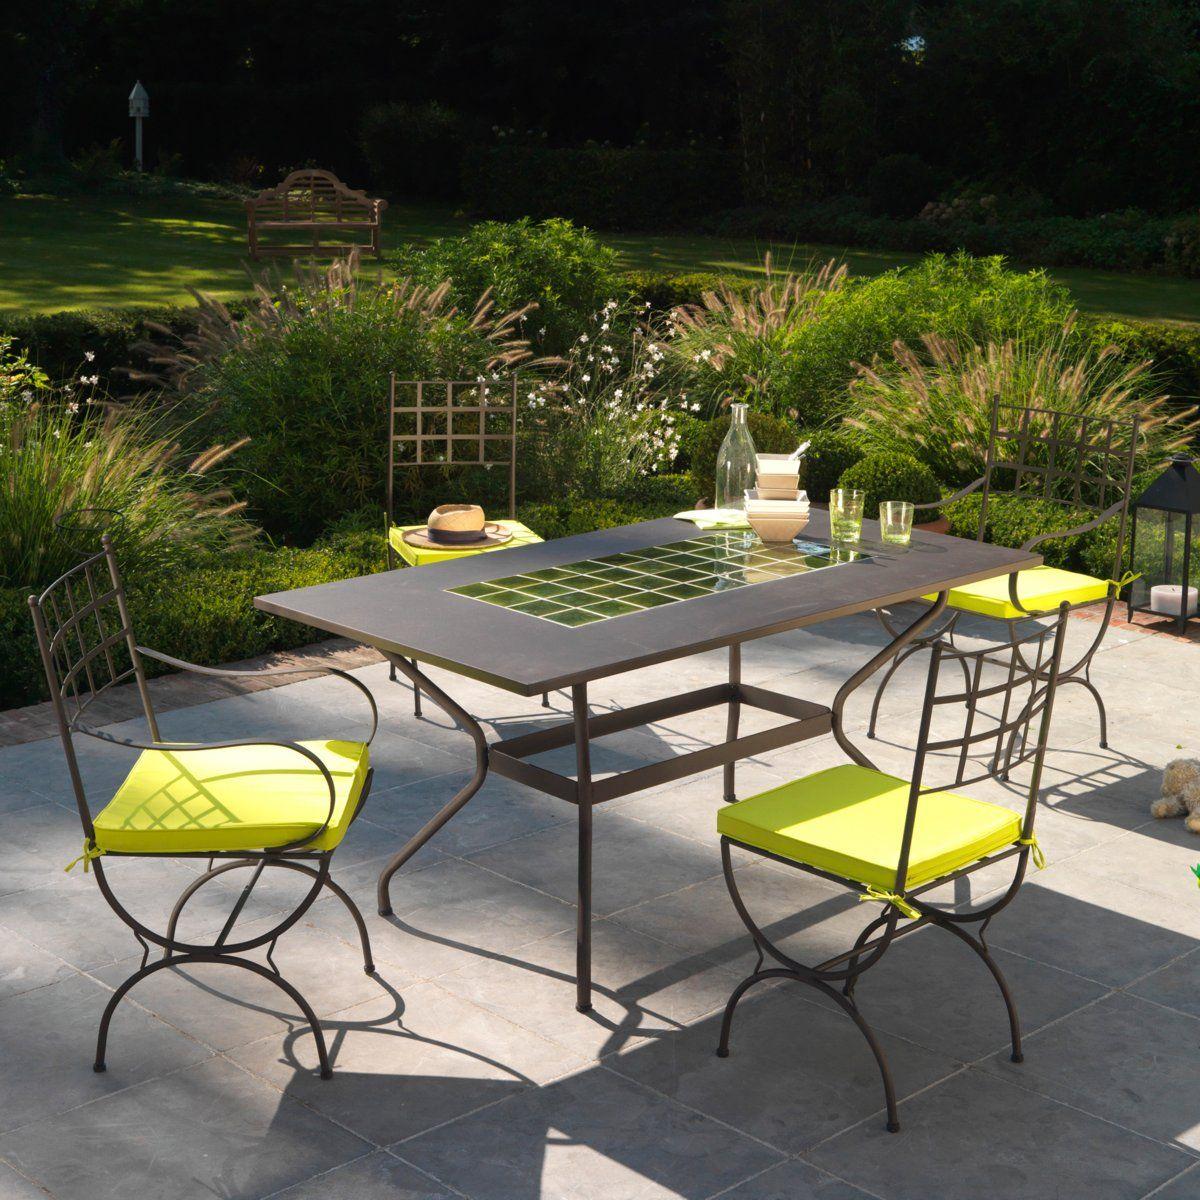 Table De Jardin La Redoute - Table De Jardin Fer Forgé Et ... intérieur Table De Jardin Promo